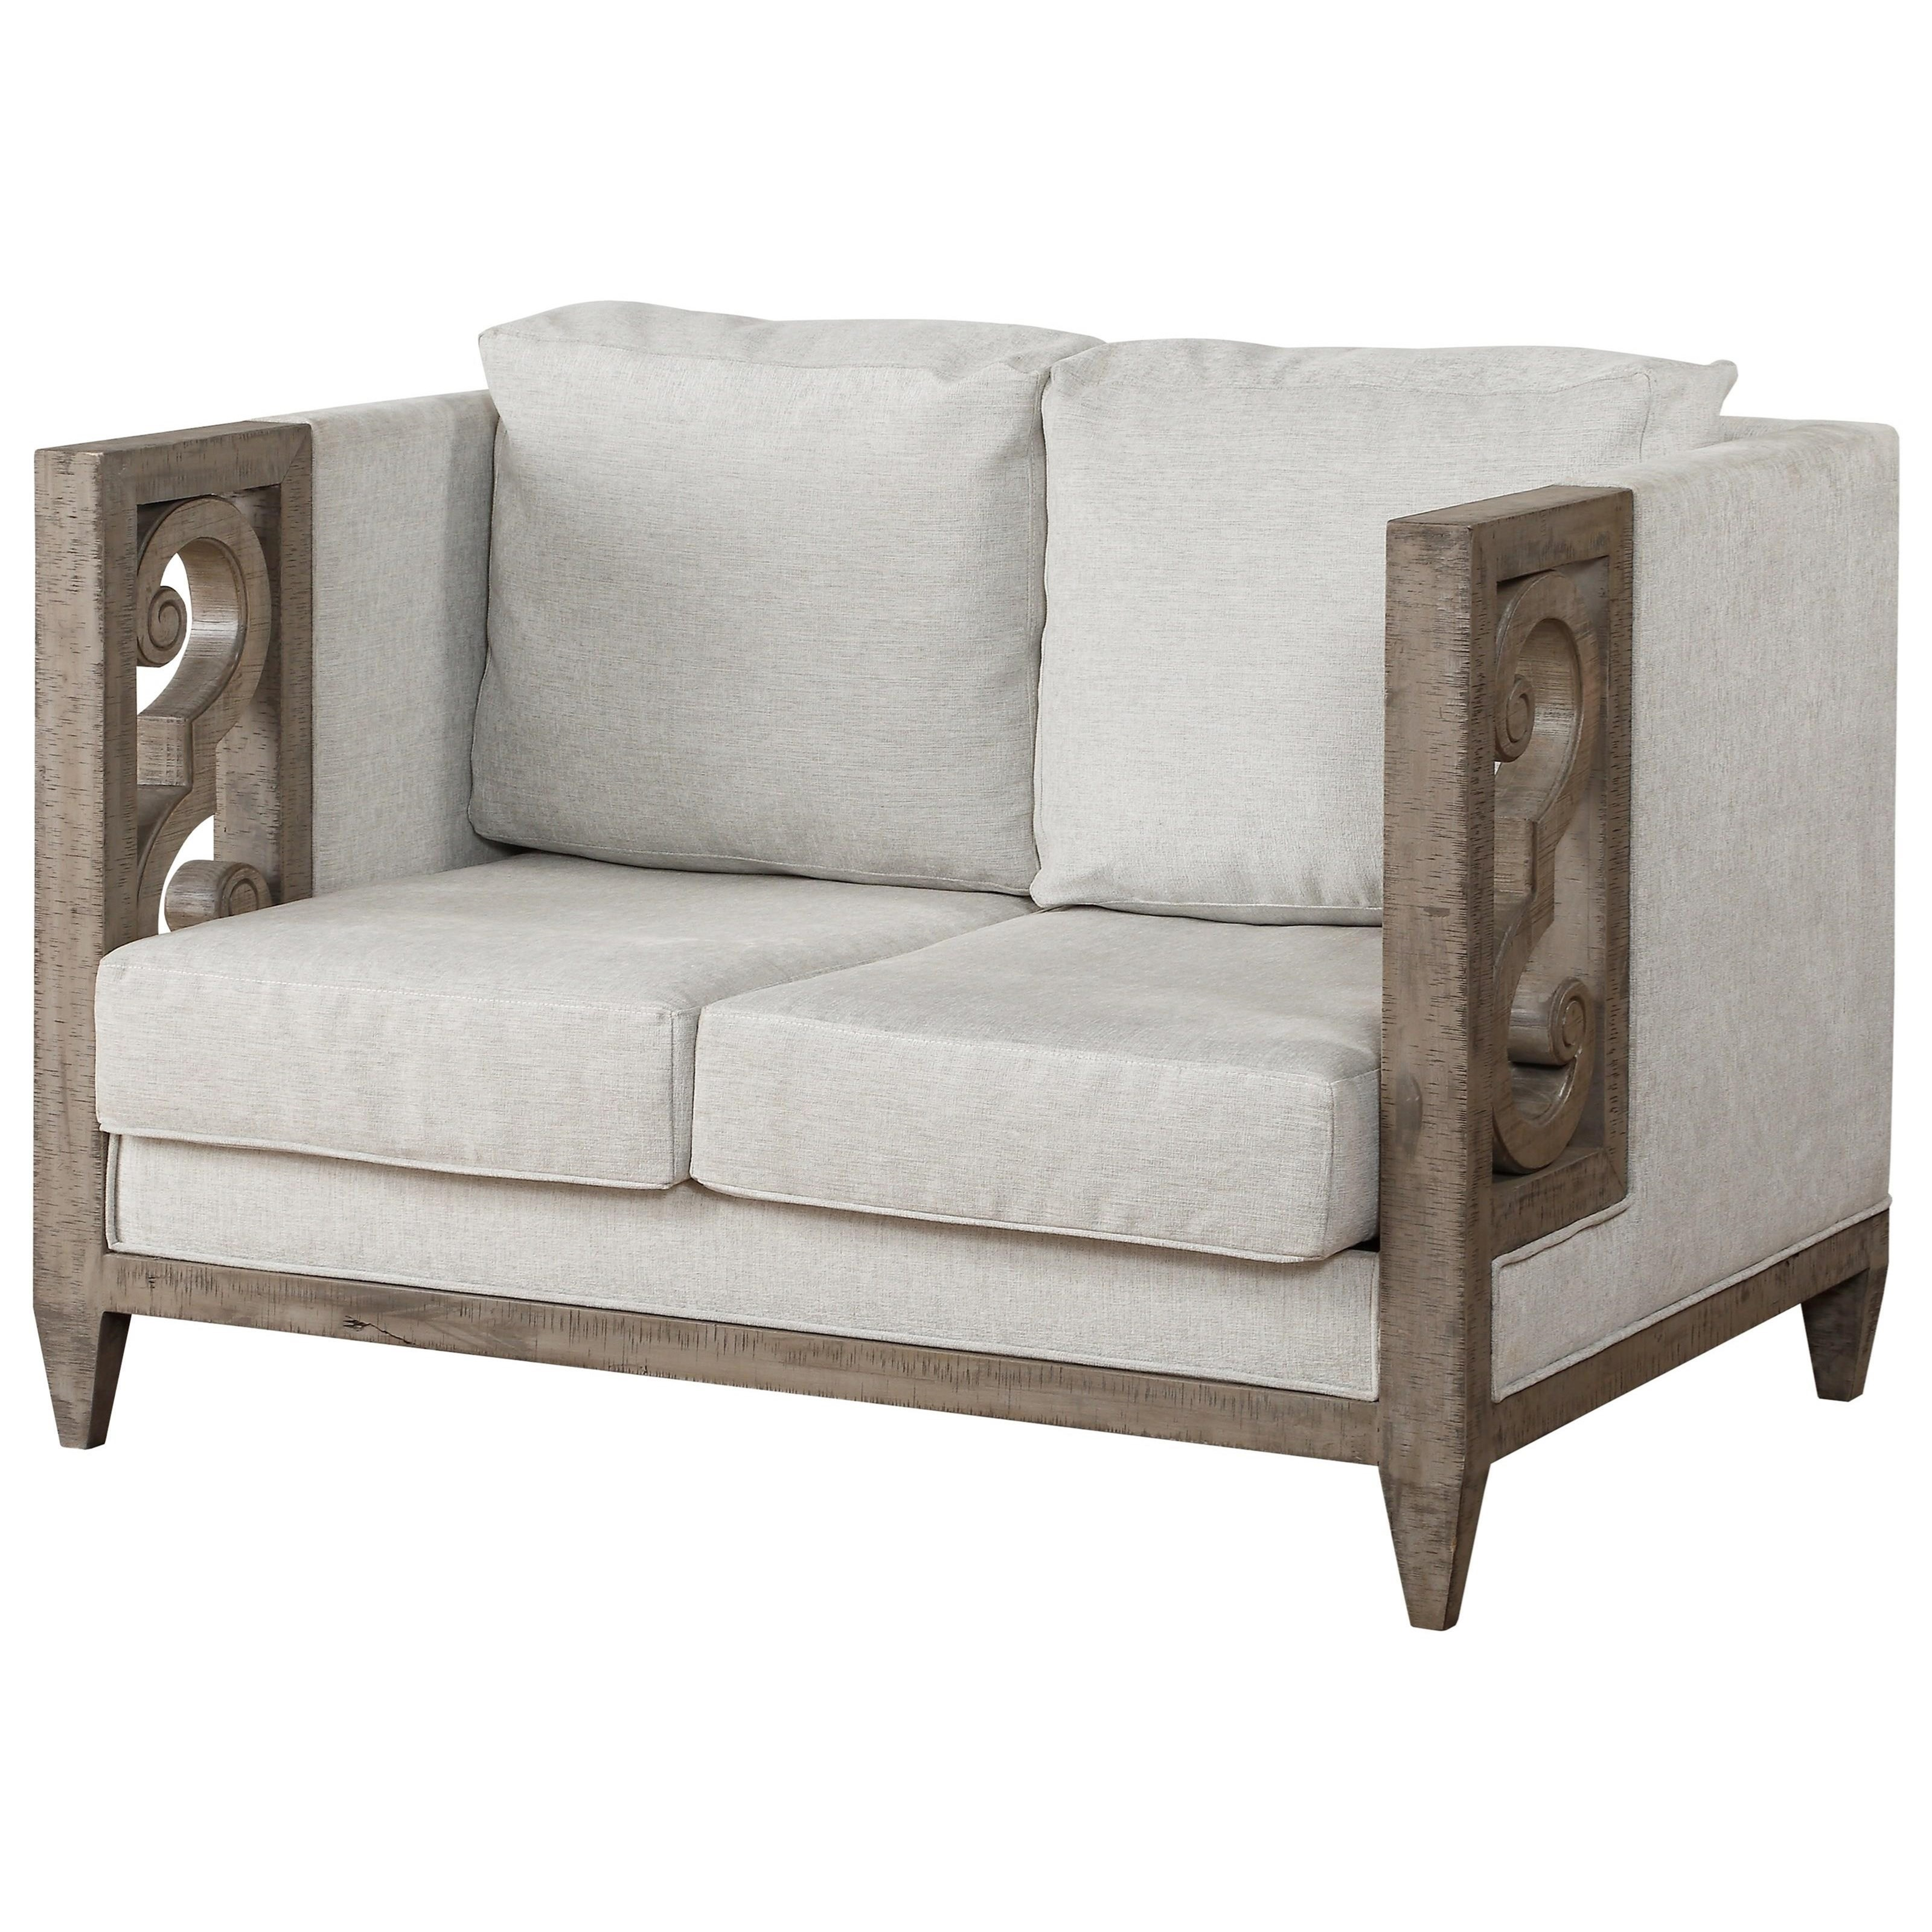 Artesia Loveseat by Acme Furniture at Carolina Direct